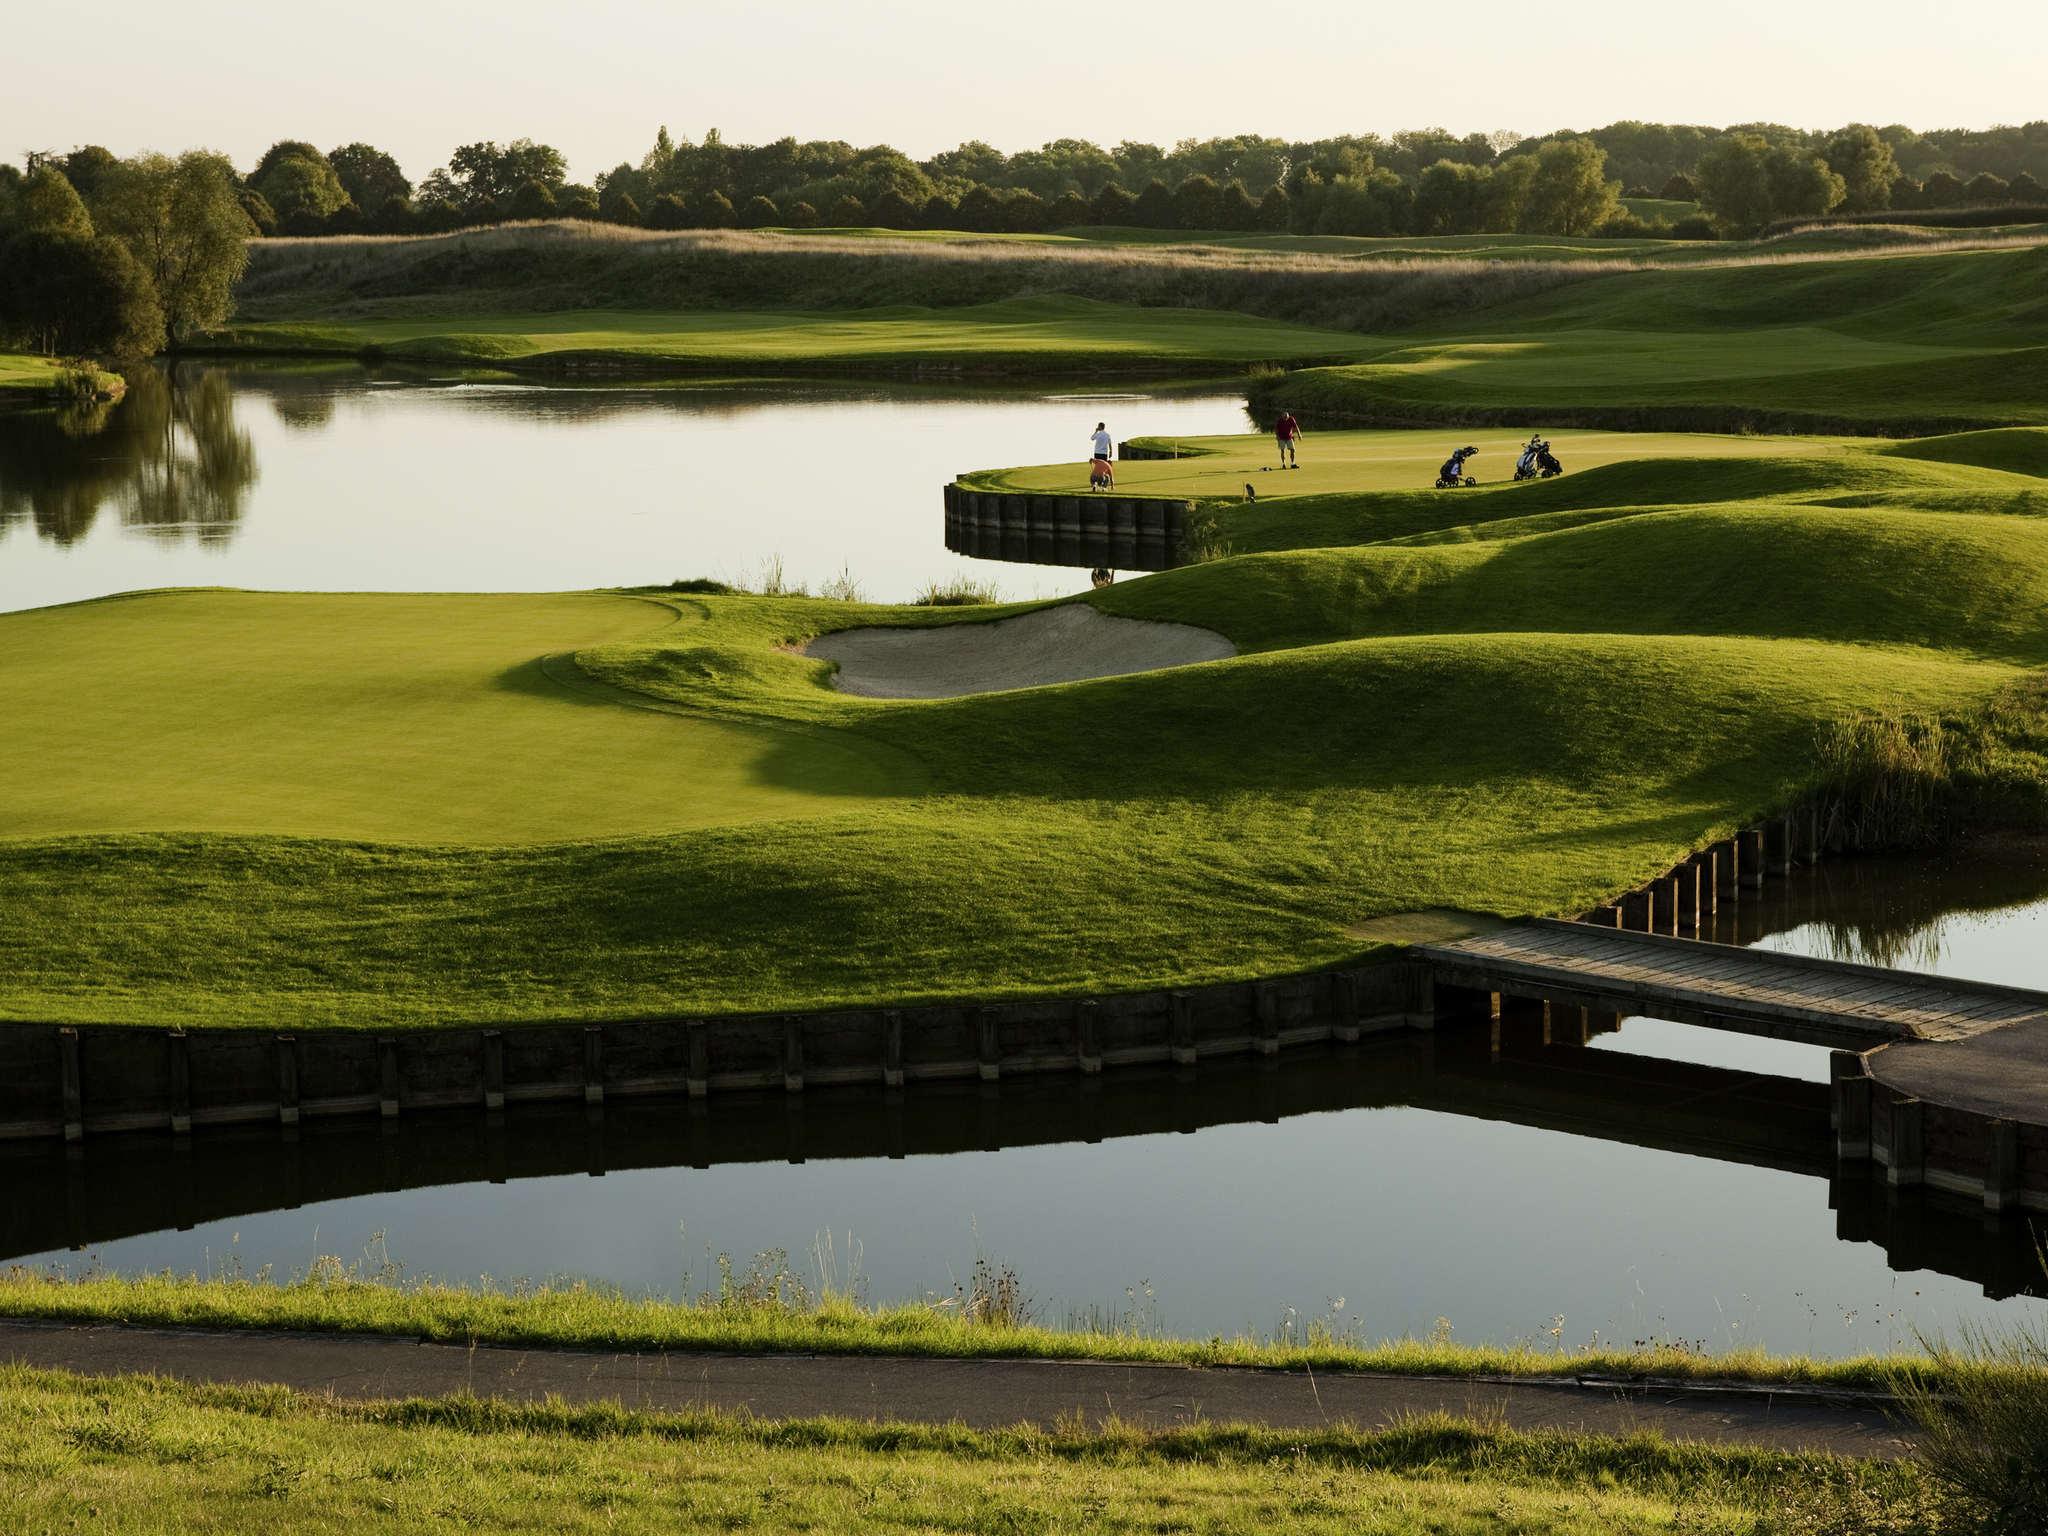 Hotel – Novotel Saint Quentin Golf National